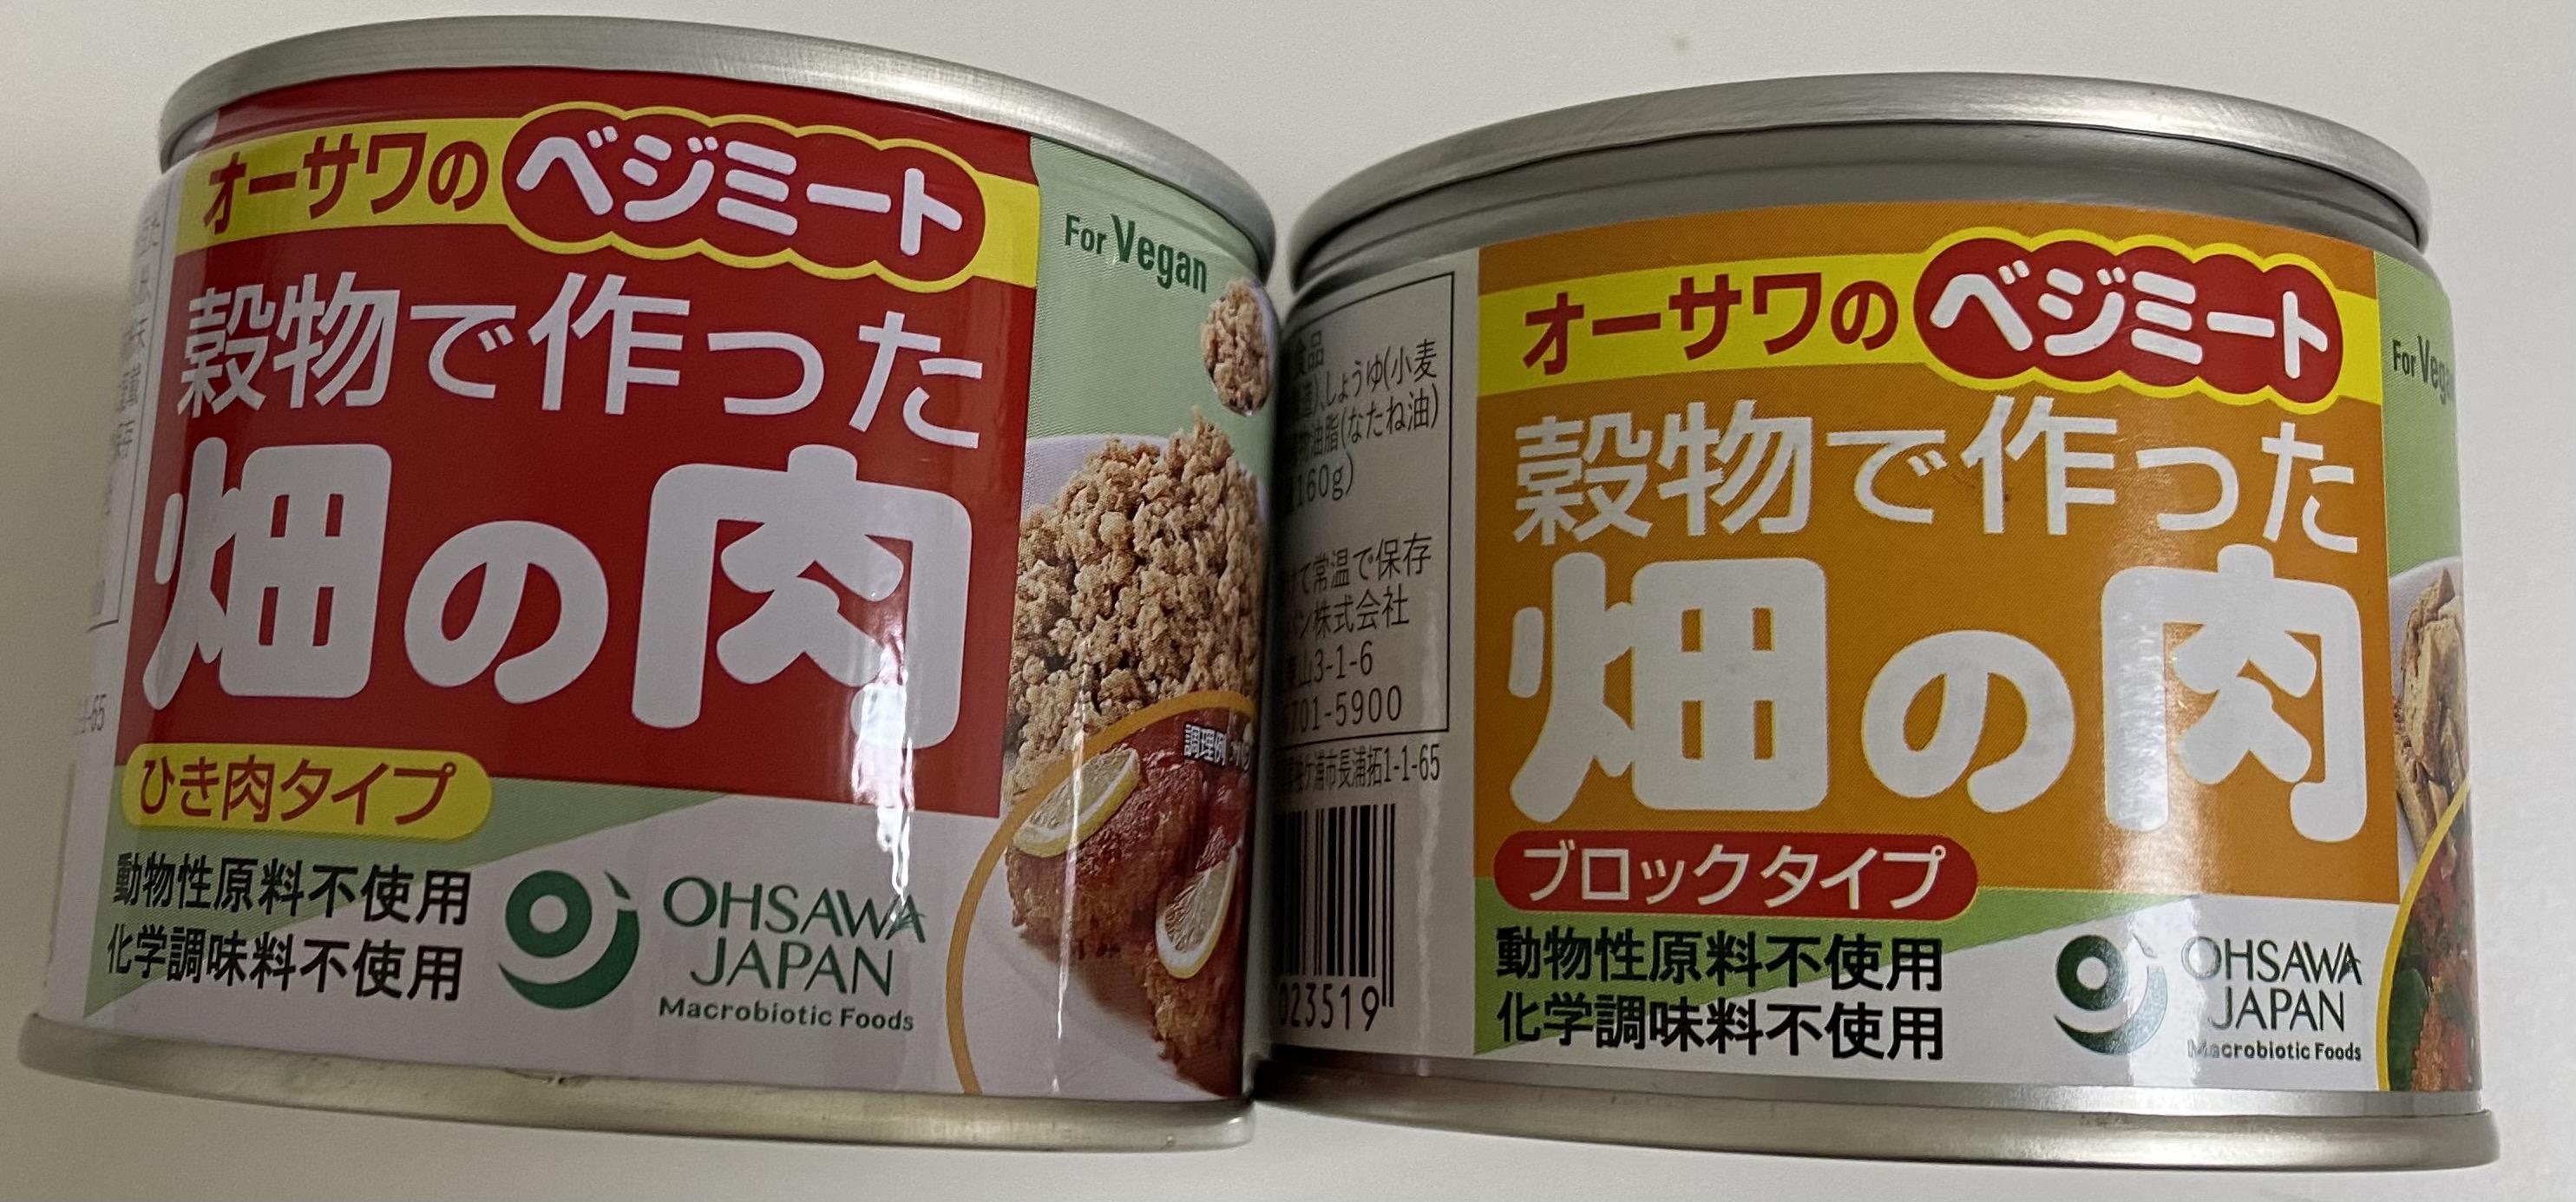 Ohsawa Japan Veggie Meat